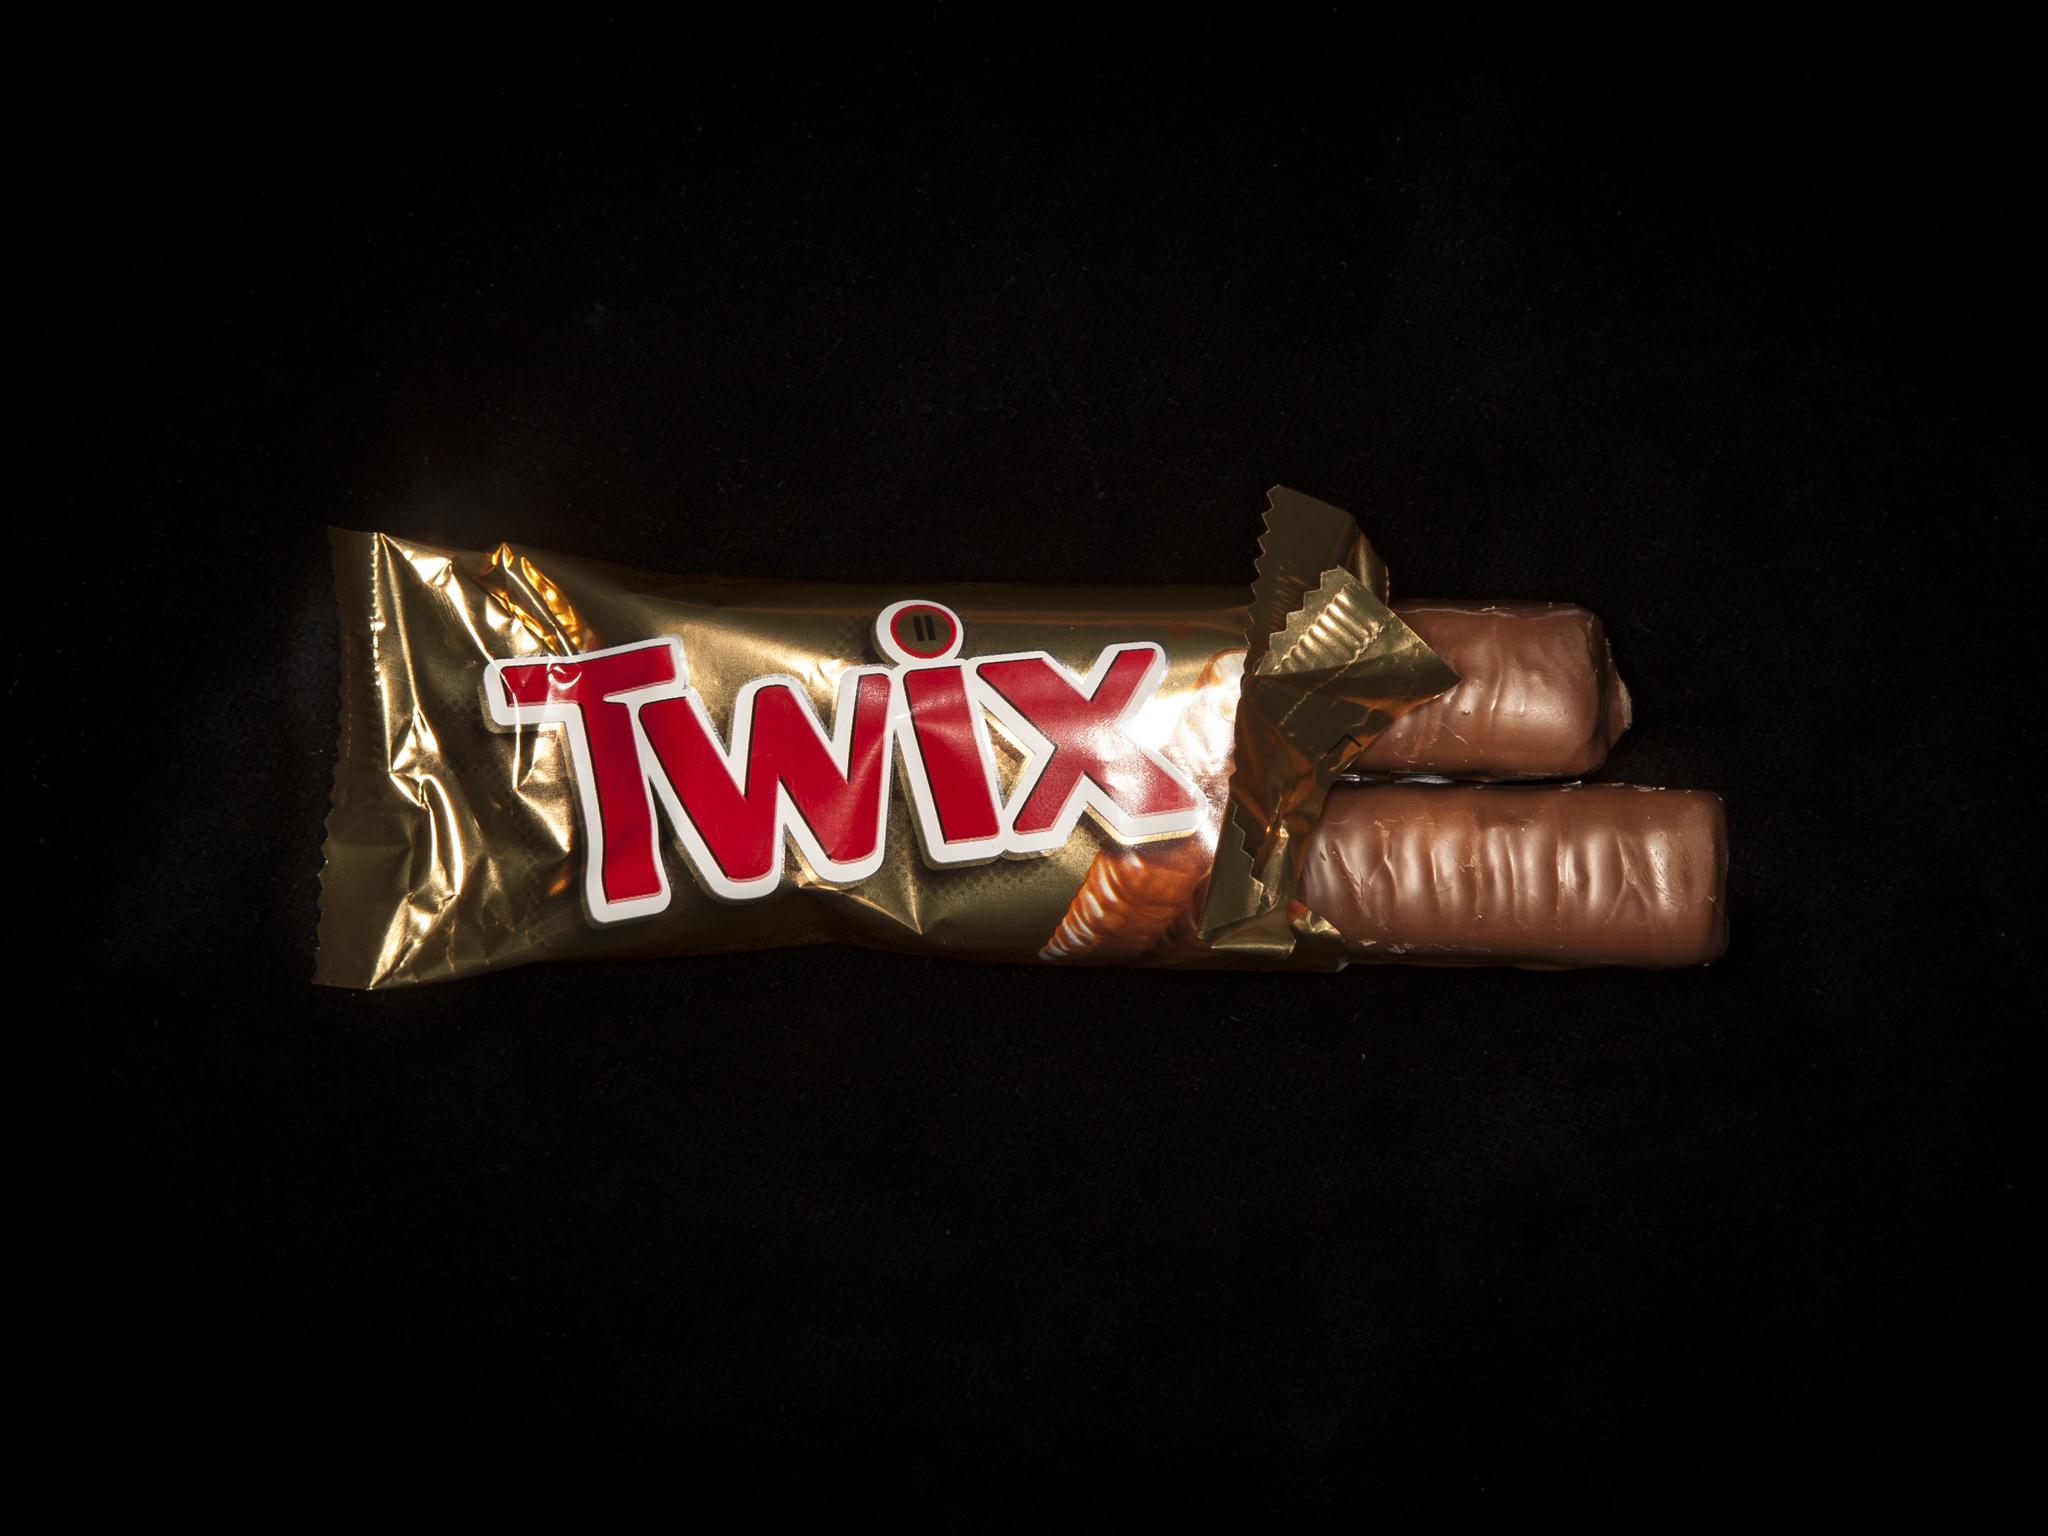 Best chocolate bars, Twix